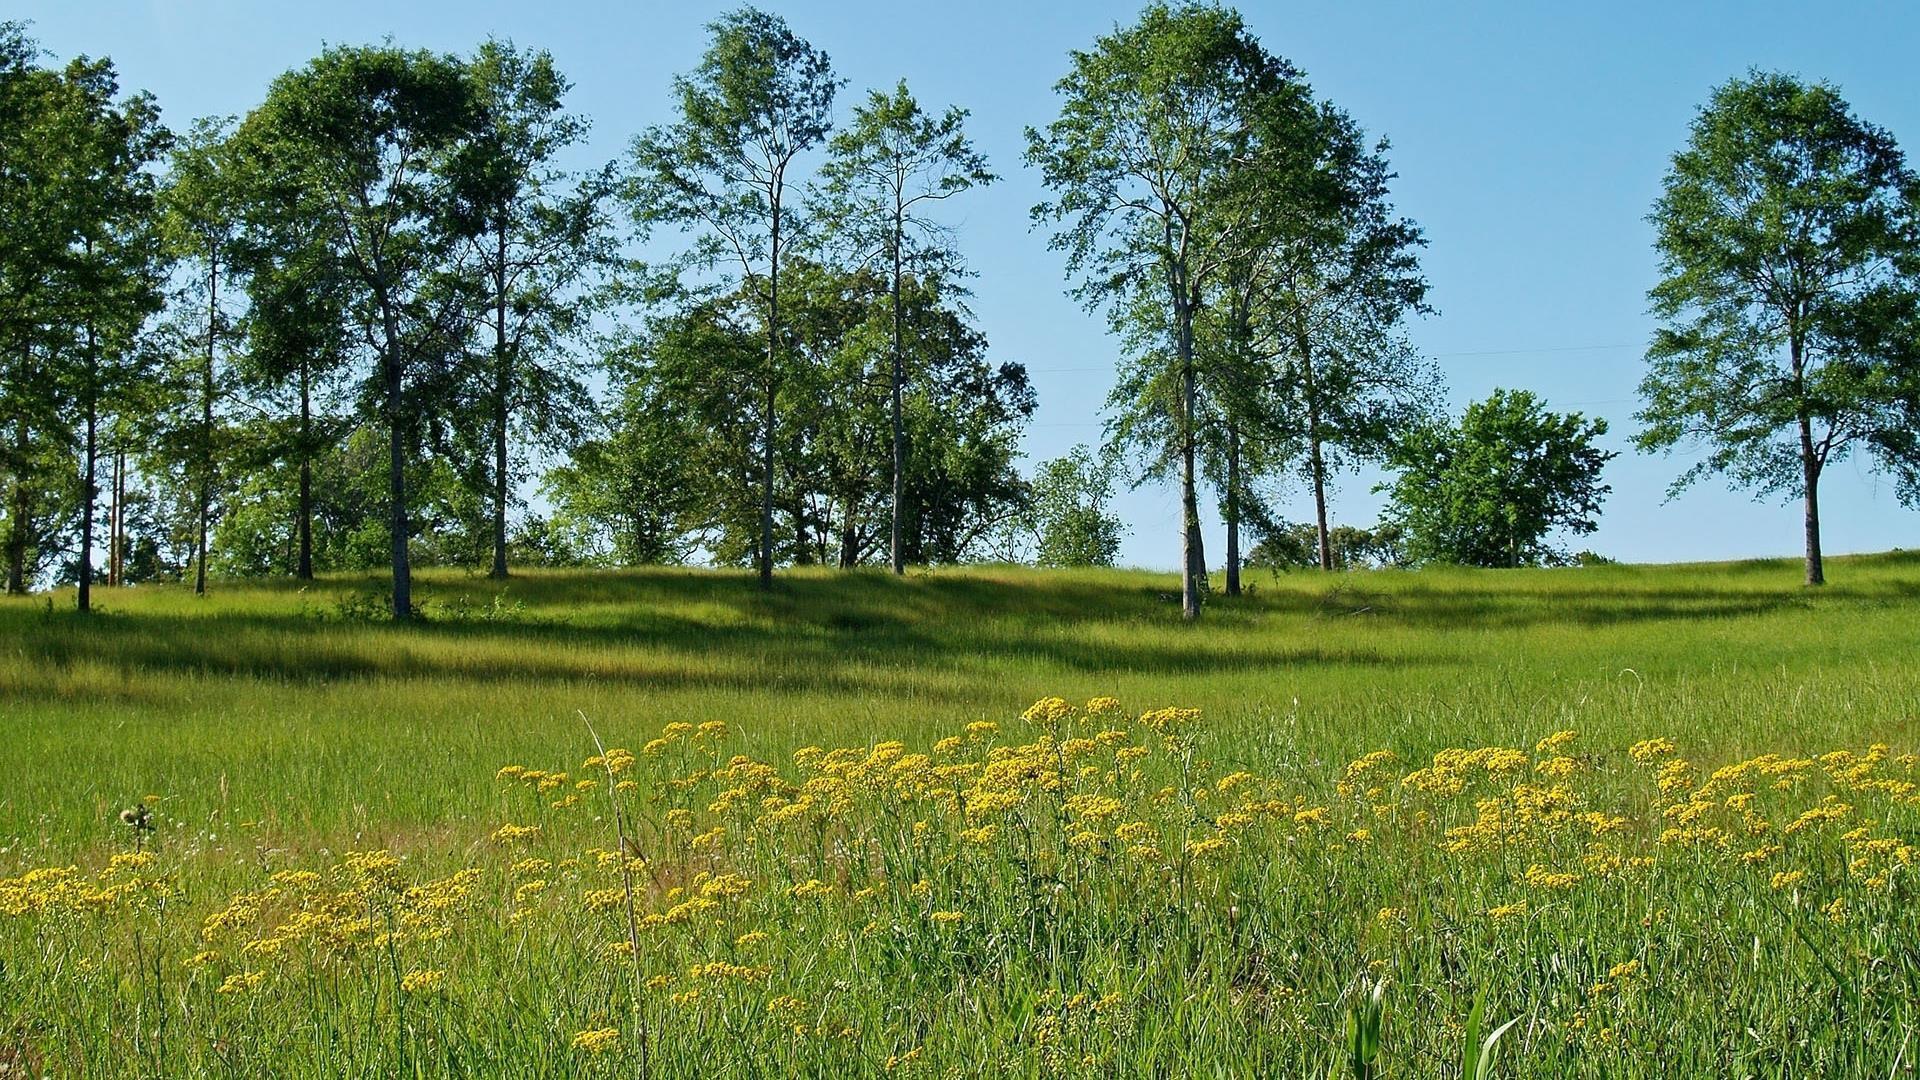 arbres-et-foret_nature-verte_2